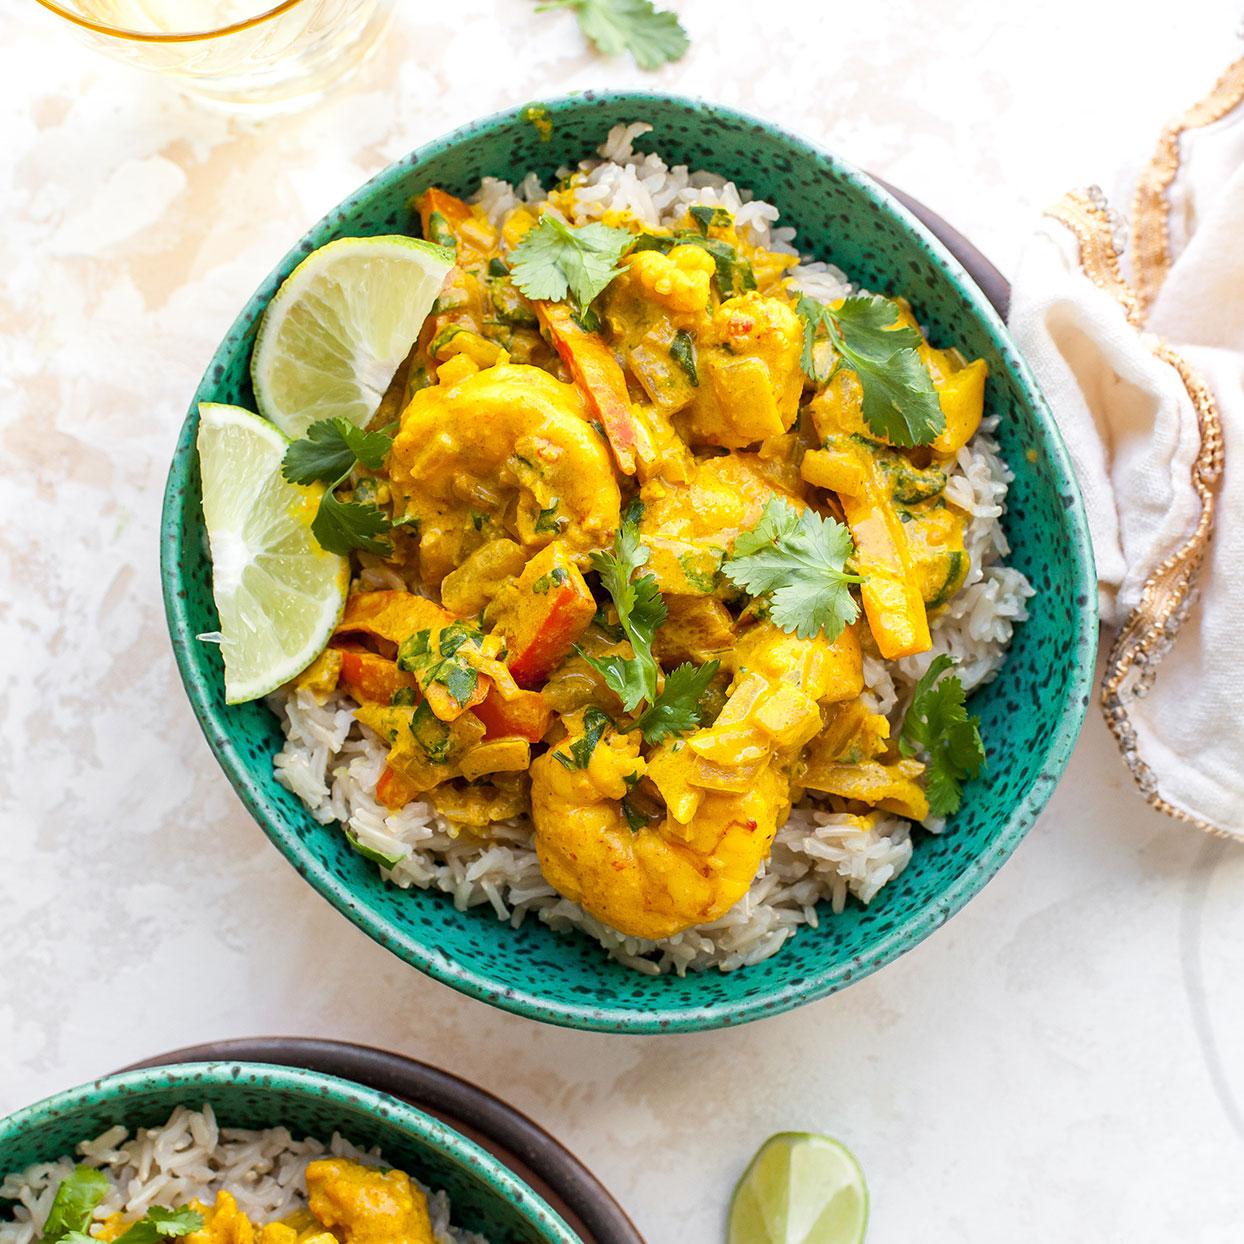 Shrimp & Coconut Milk Curry EatingWell Test Kitchen